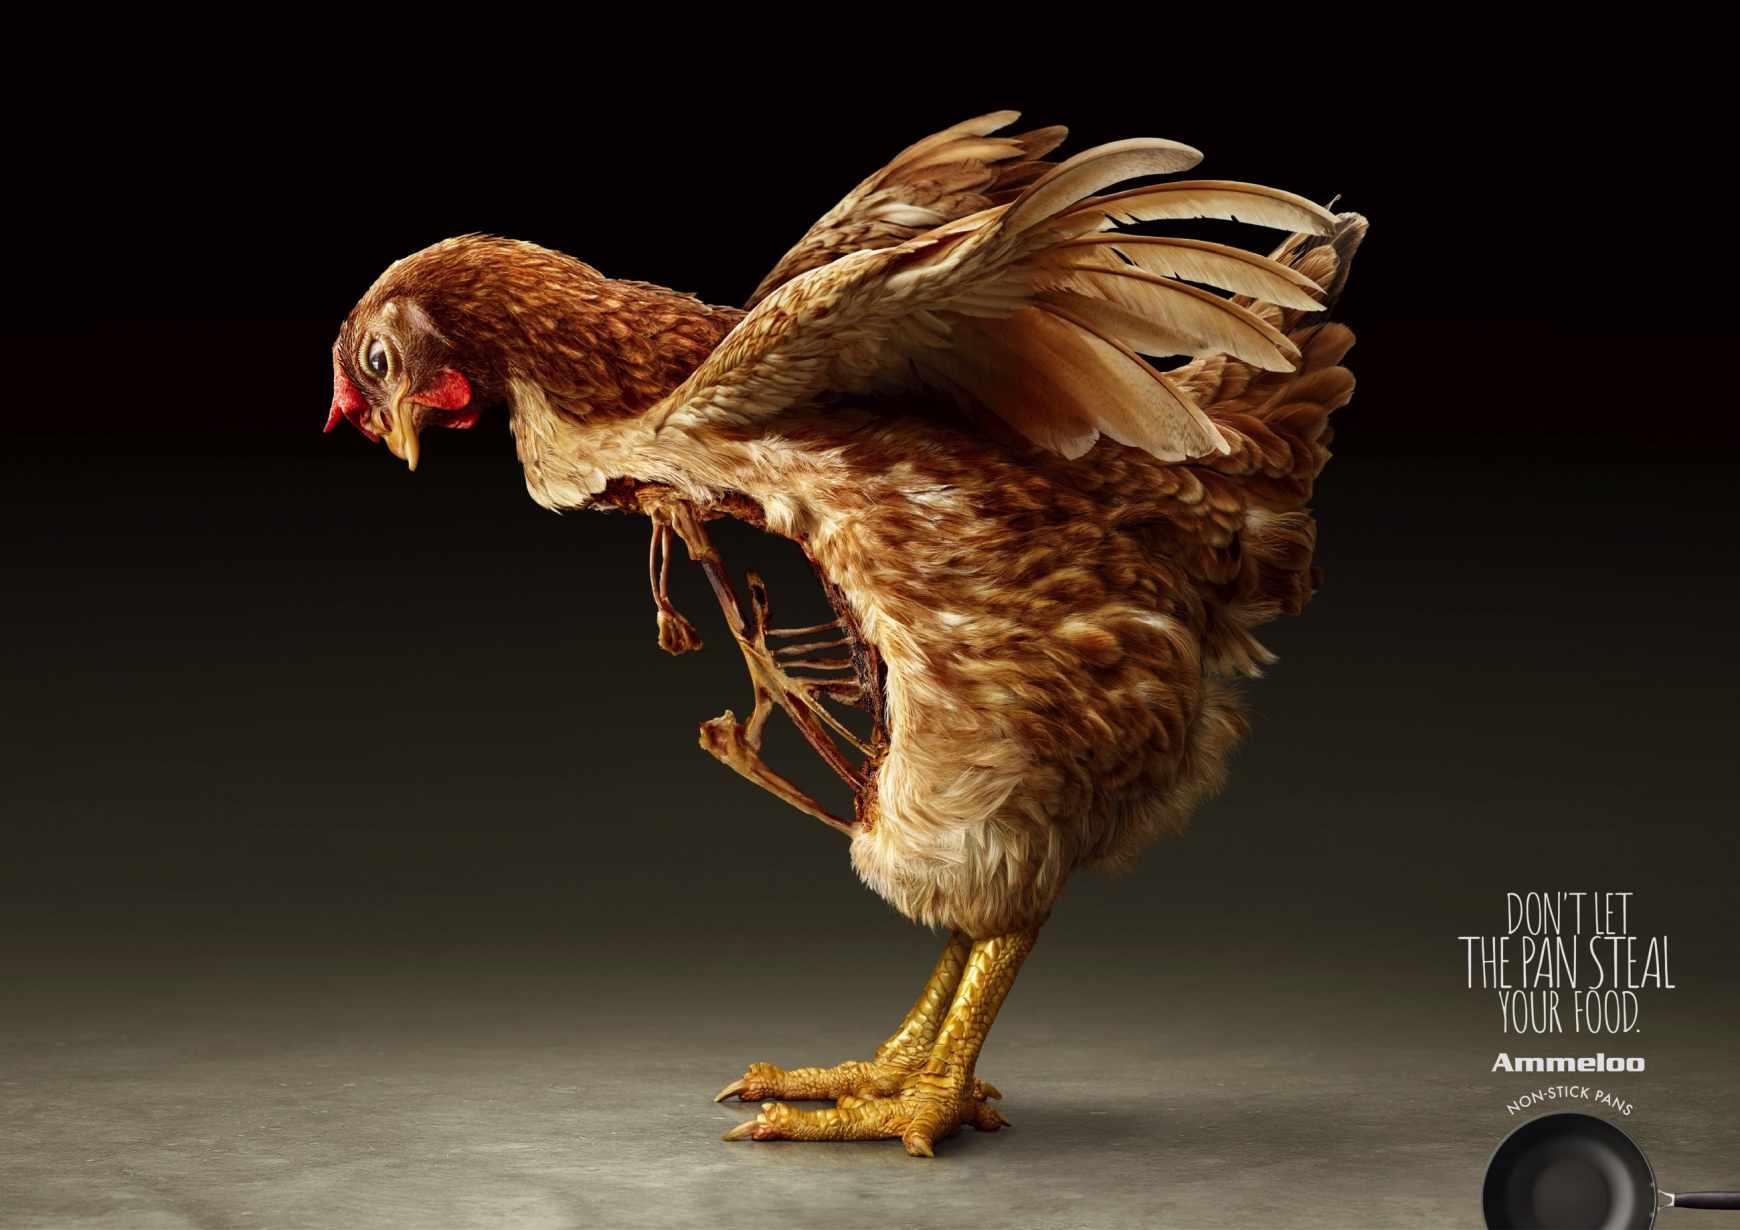 Ammeloo Print Ad - Breastless Hen